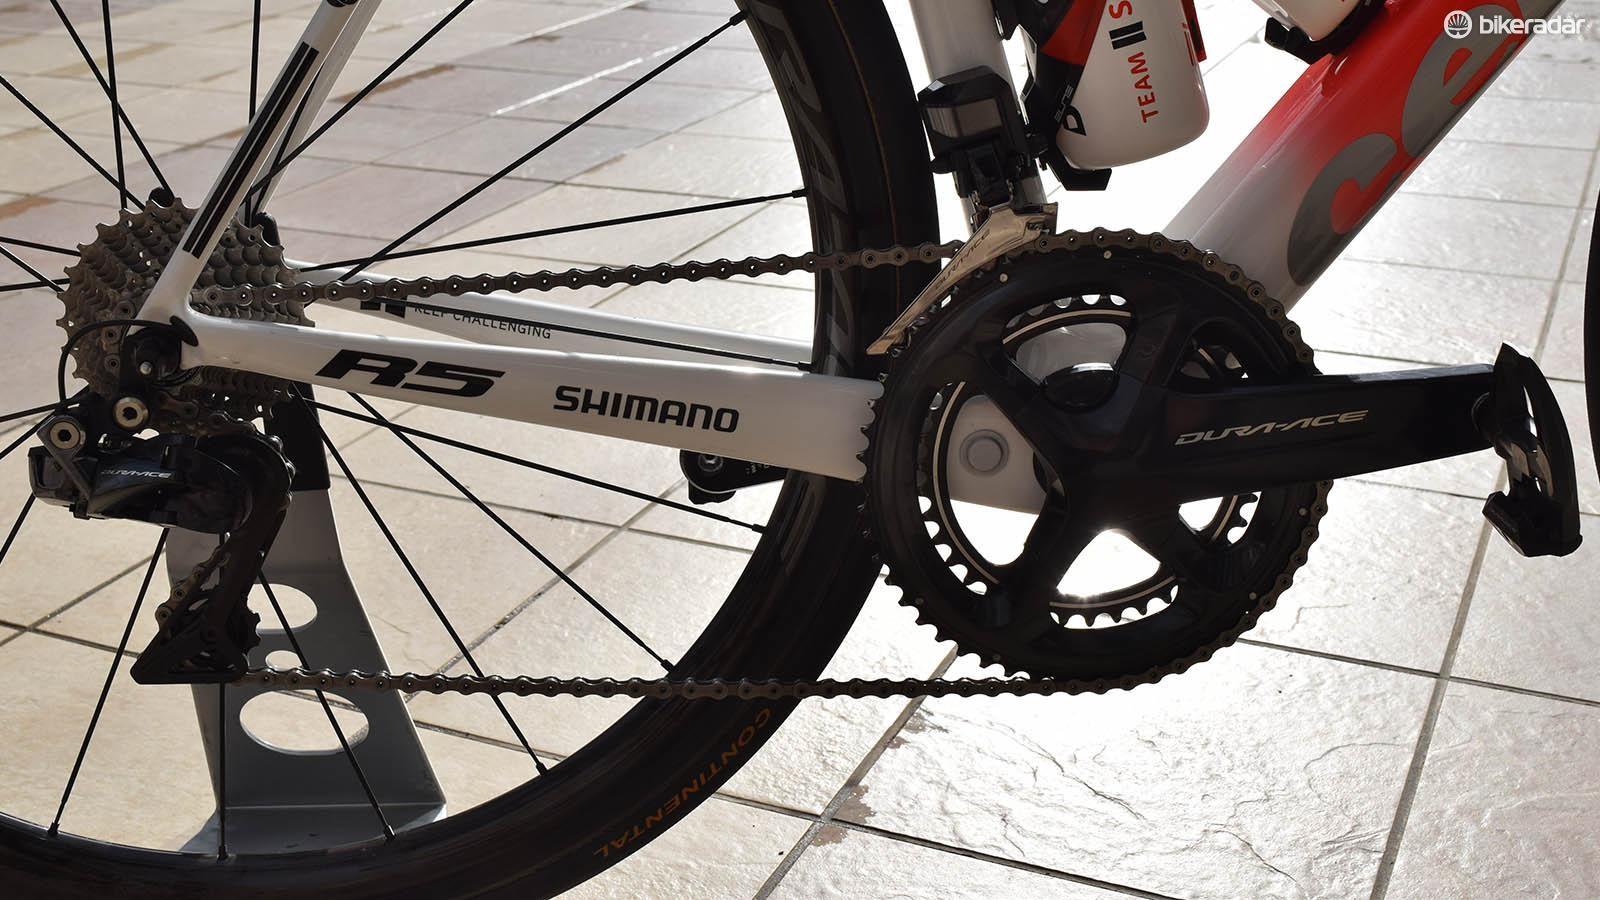 Like last season's Giants, Team Sunweb is using Shimano Dura-Ace R9100 series drivetrains